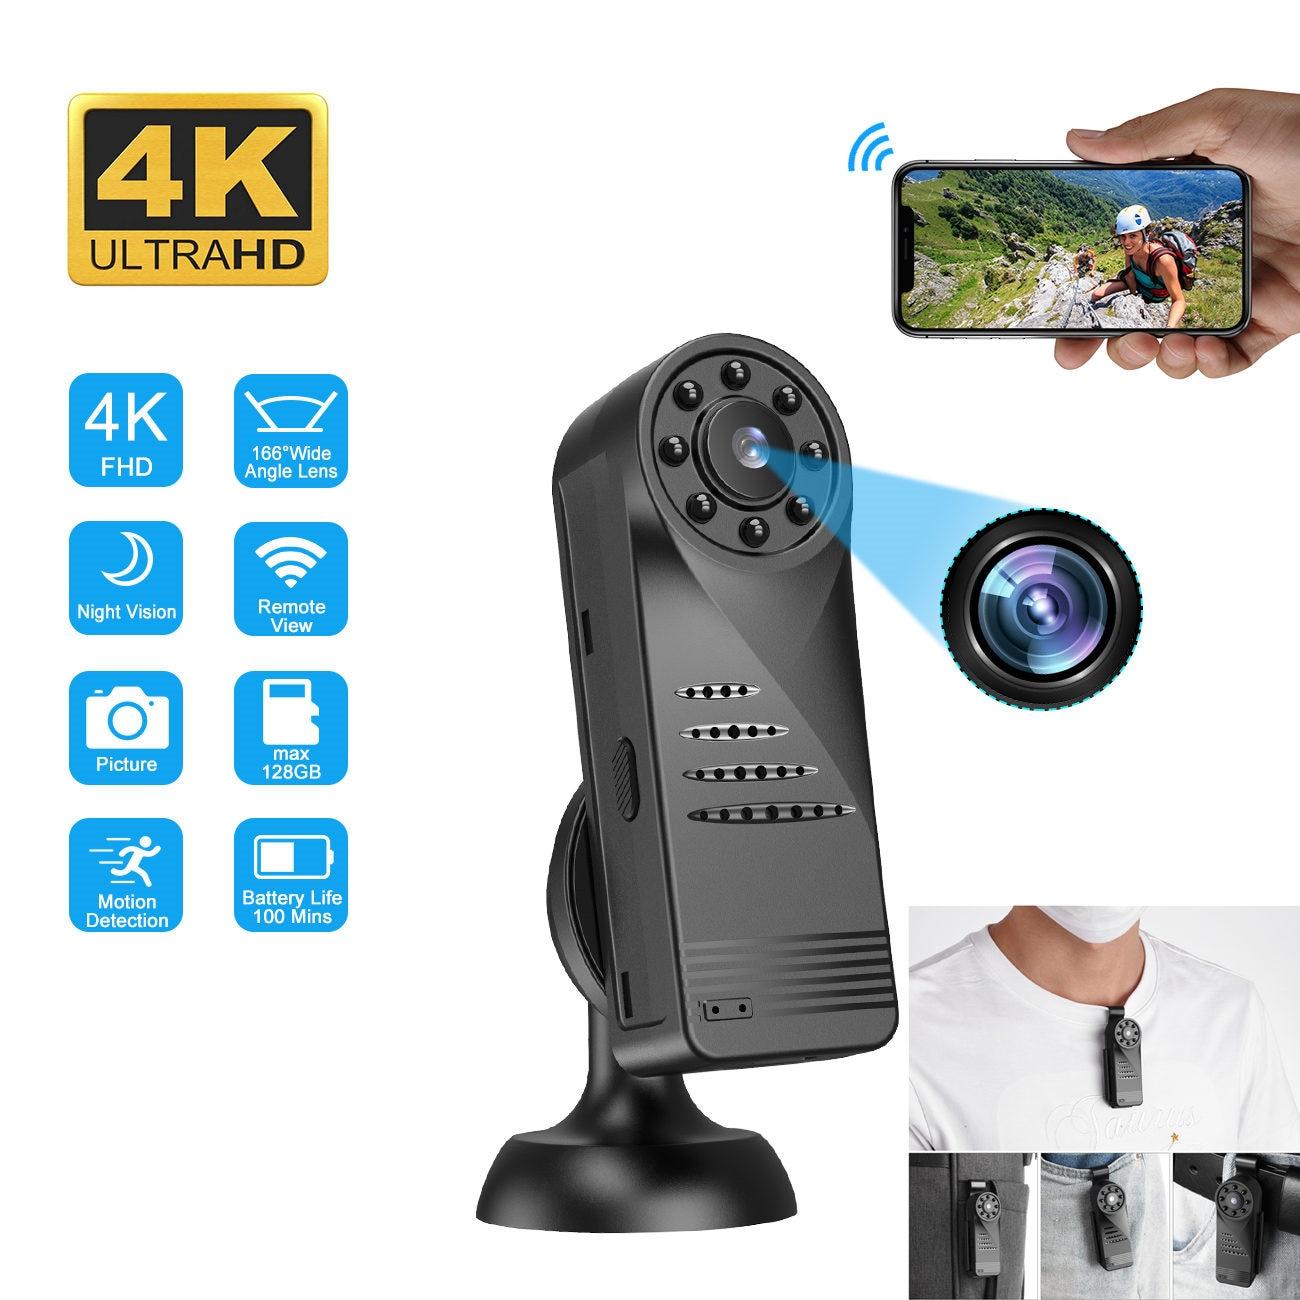 Minicámara Digital portátil 4K, videocámara corporal inteligente inalámbrica, WiFi, HD, Micro cámara...